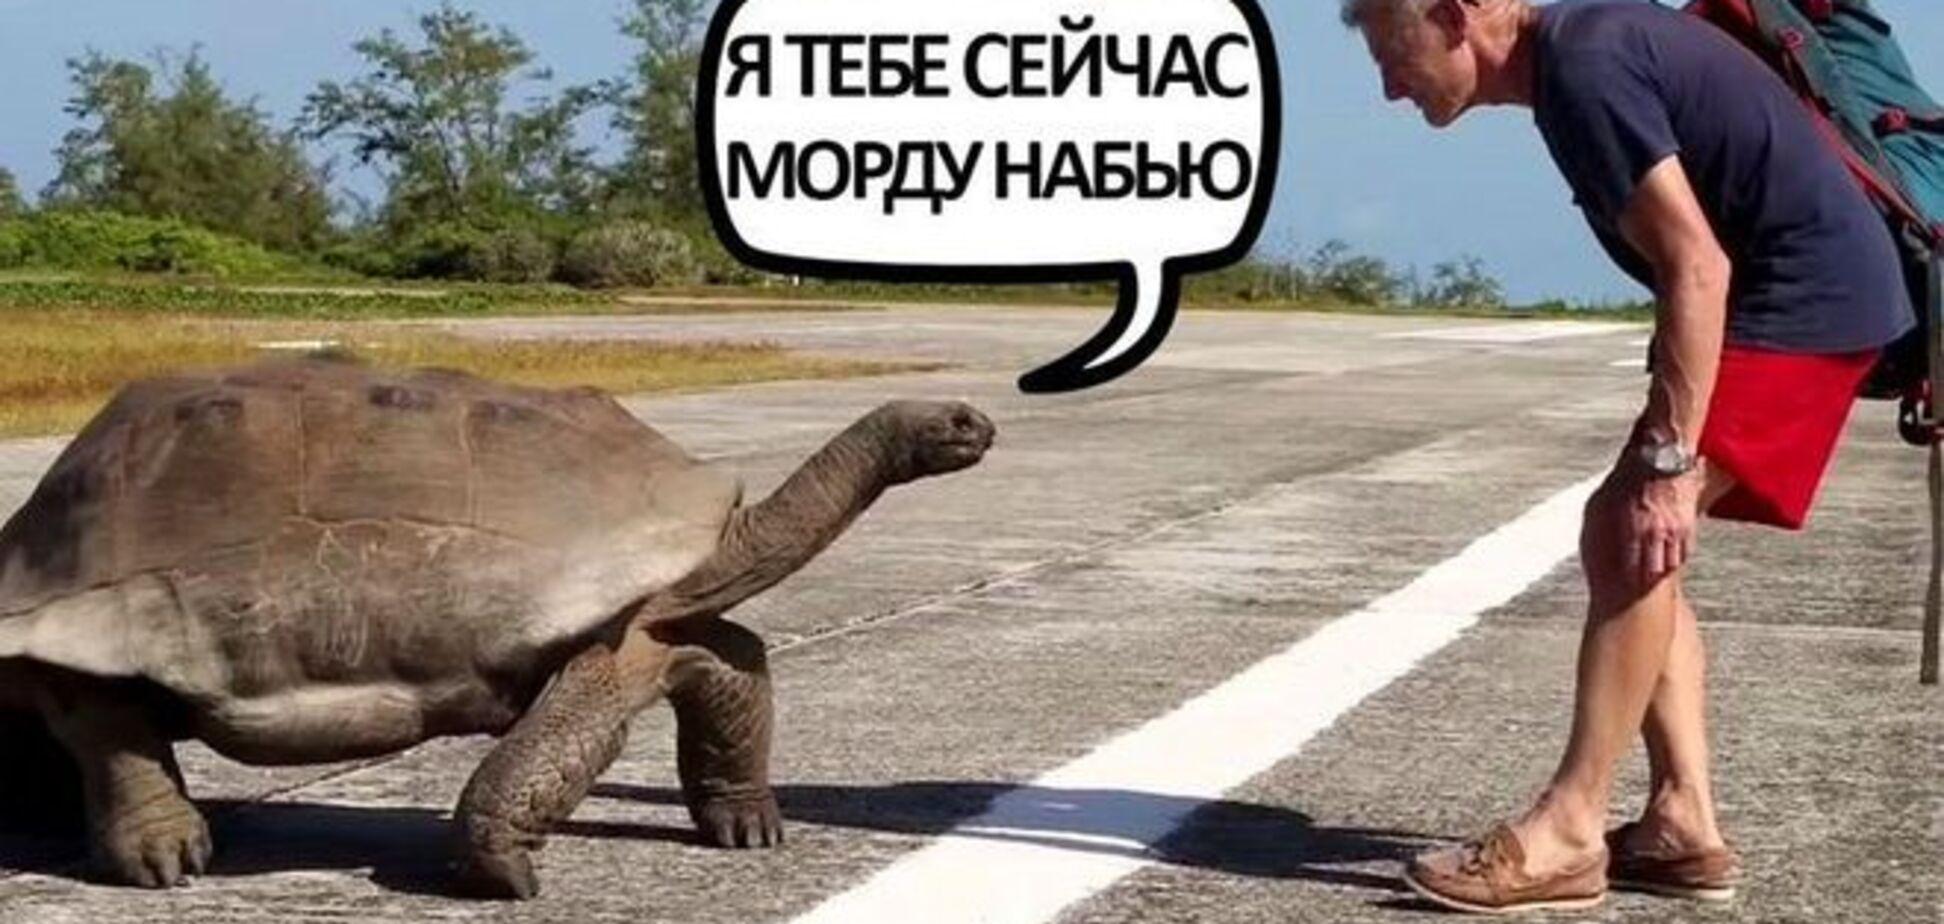 Я тебе сейчас морду набью: черепаха жестоко прогнала ведущего National Geographic